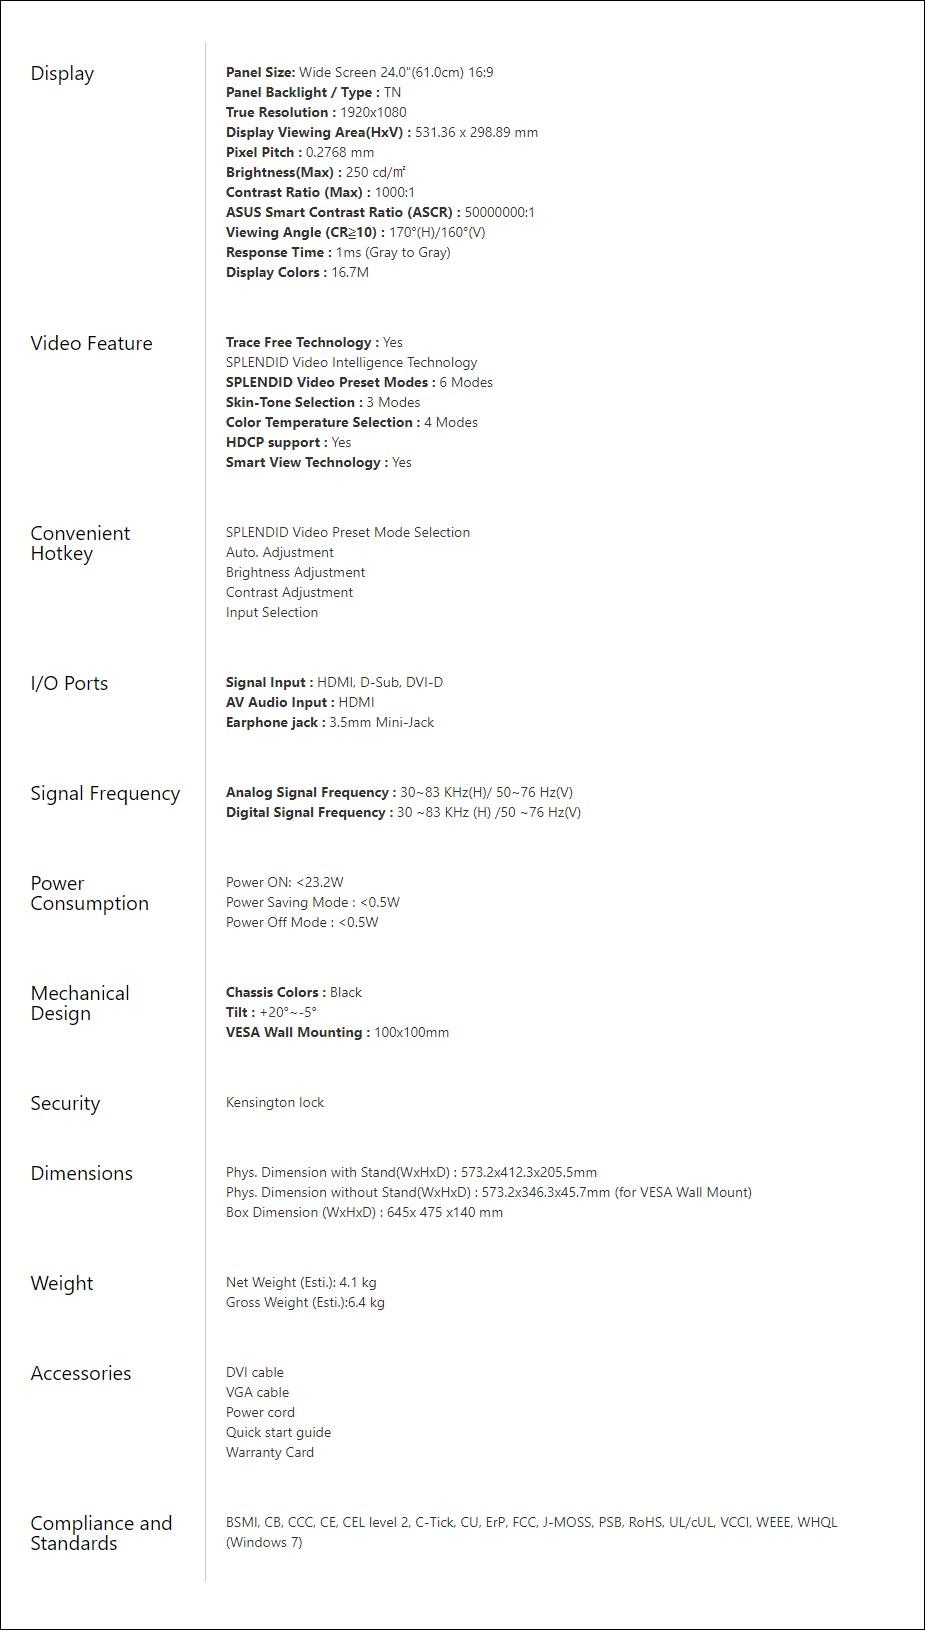 asus-vs248hr-24-full-hd-1ms-tn-gaming-monitor-ac28581-5.jpg